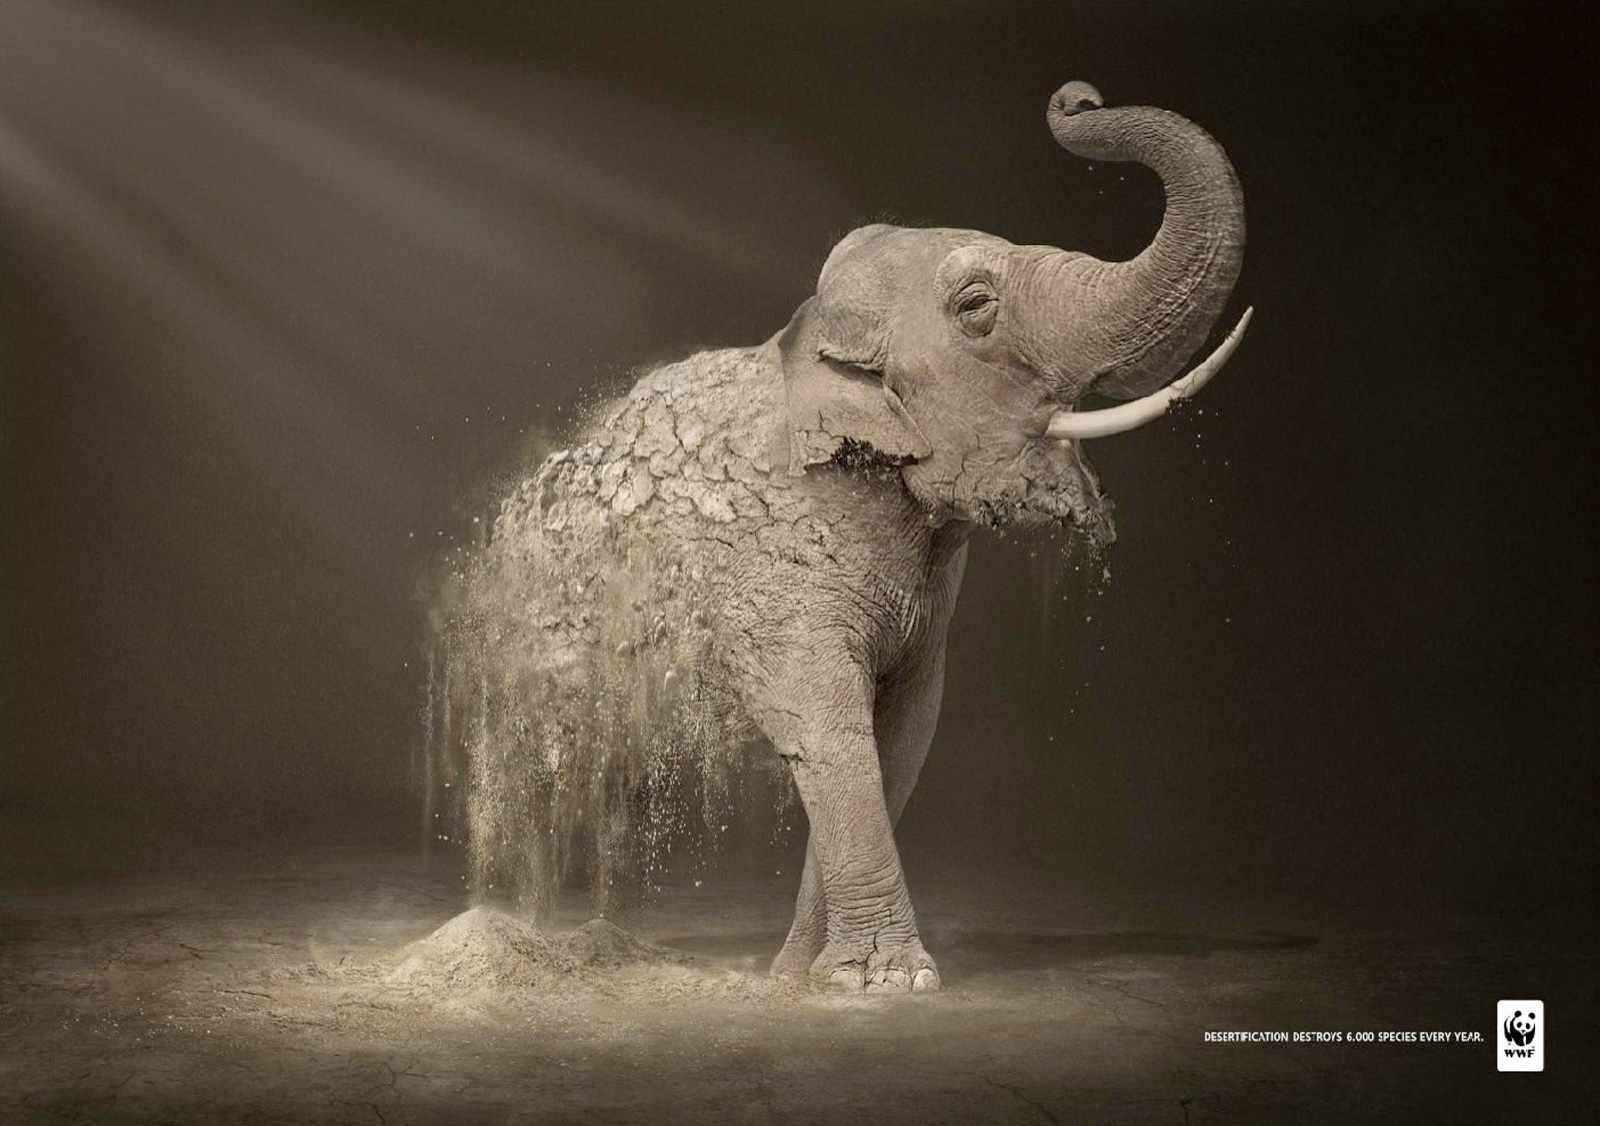 wwf_elephant